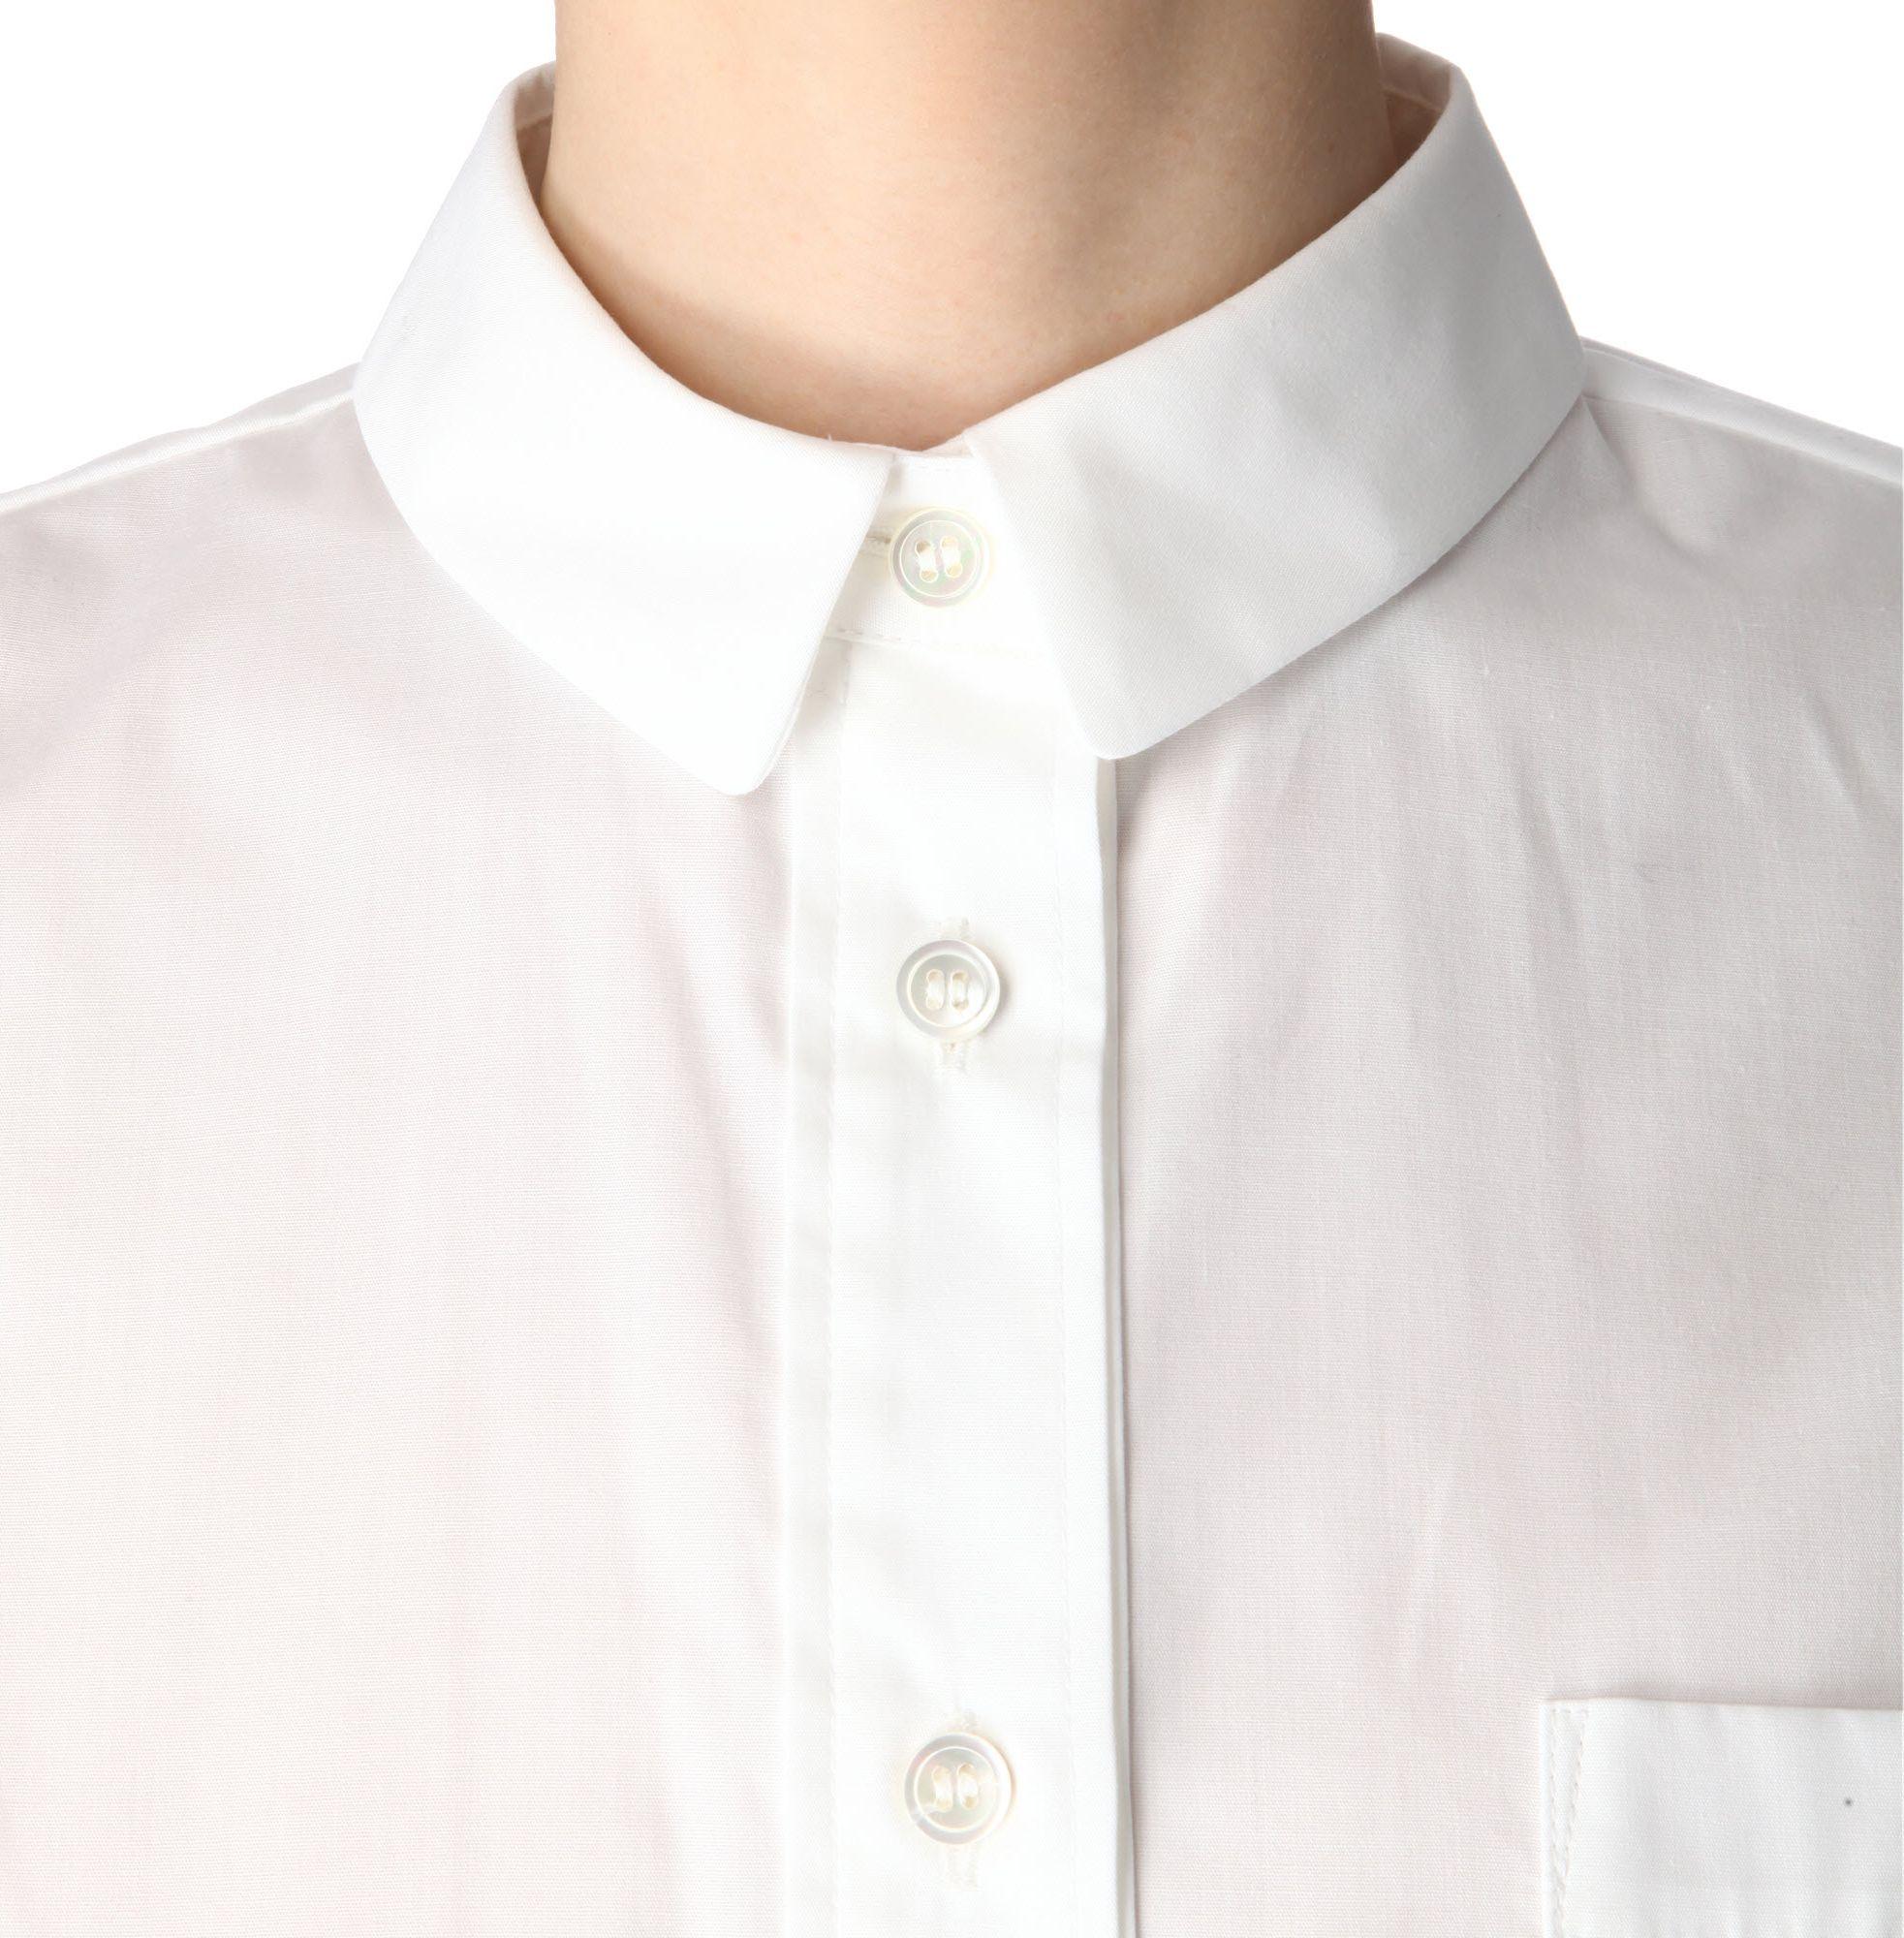 clothing mens selfridges shop online